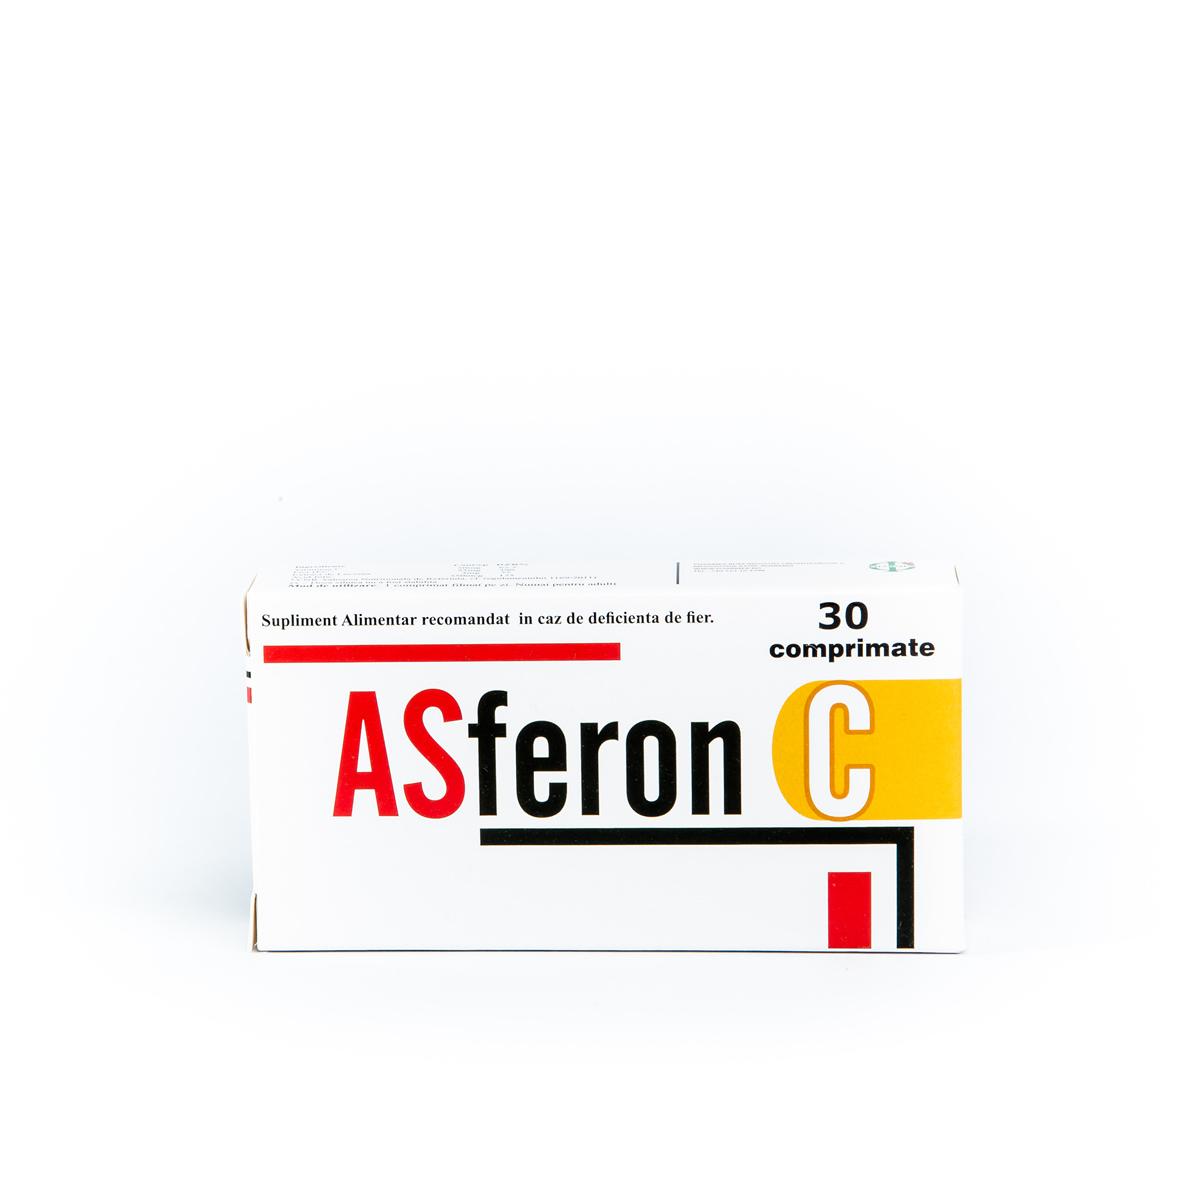 IP2_asferon_c